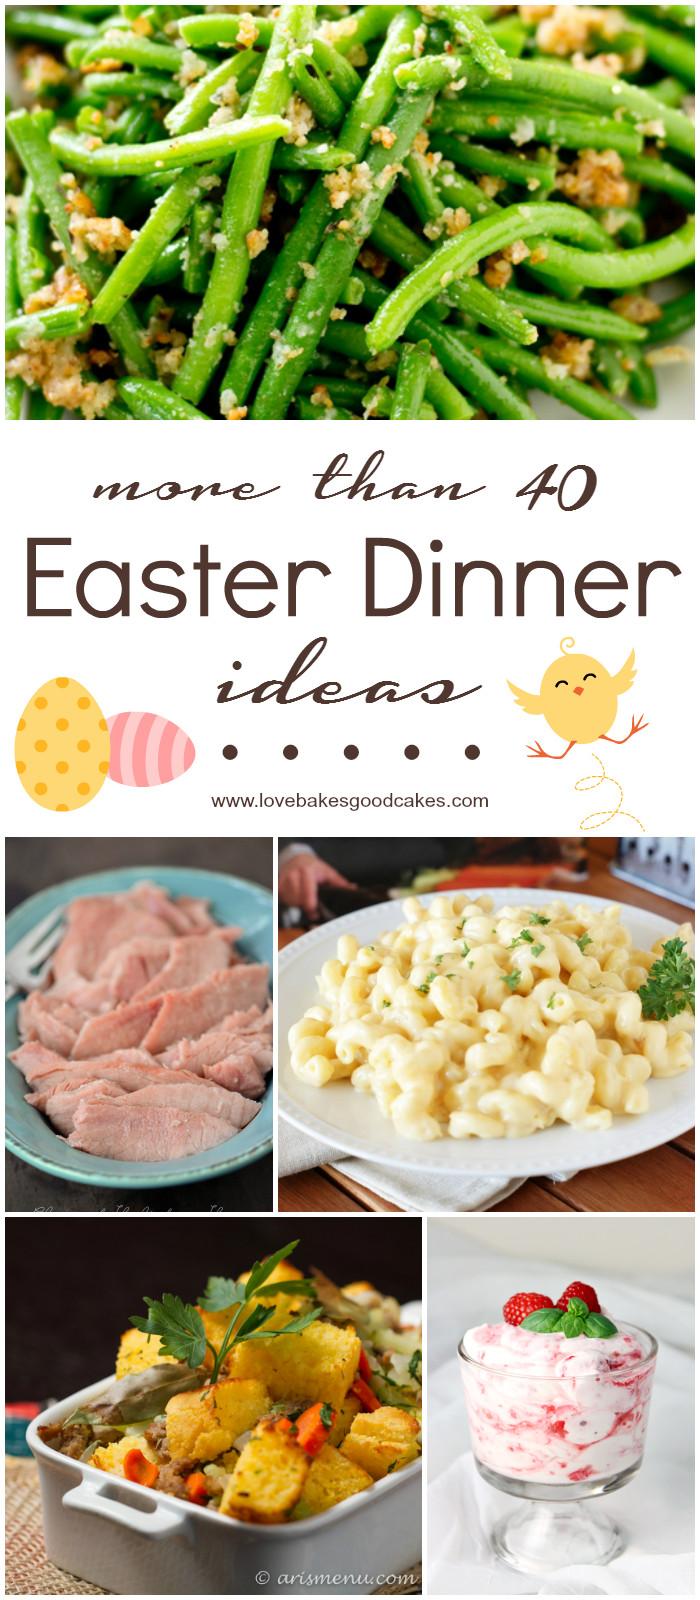 Easter Dinner Menu Ideas  More than 40 Easter Dinner Ideas